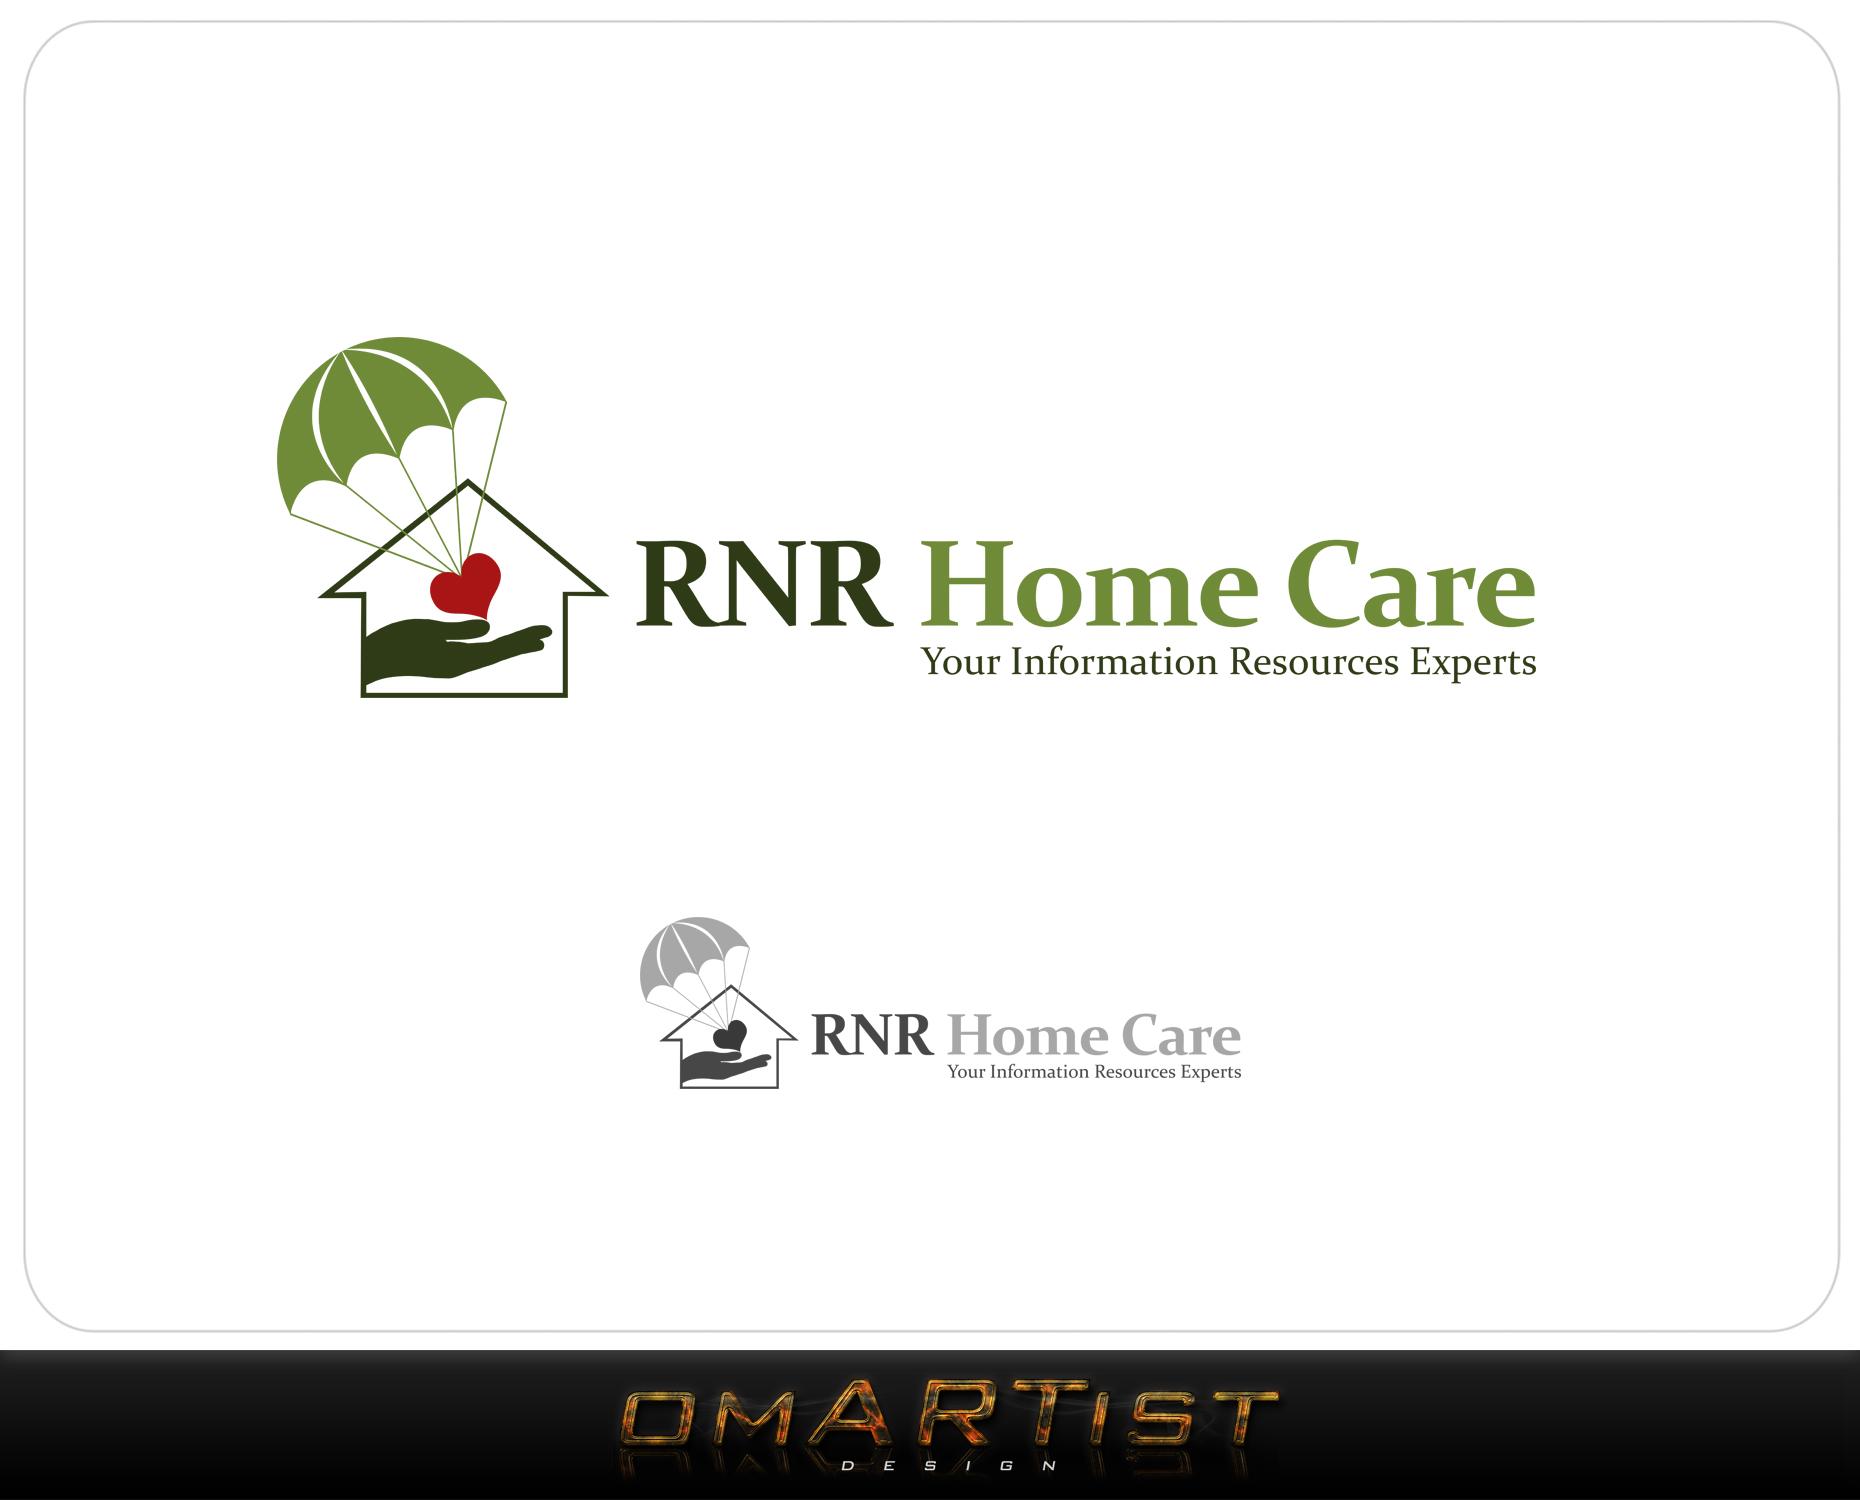 Logo Design by omARTist - Entry No. 1 in the Logo Design Contest Imaginative Logo Design for RNR HomeCare.